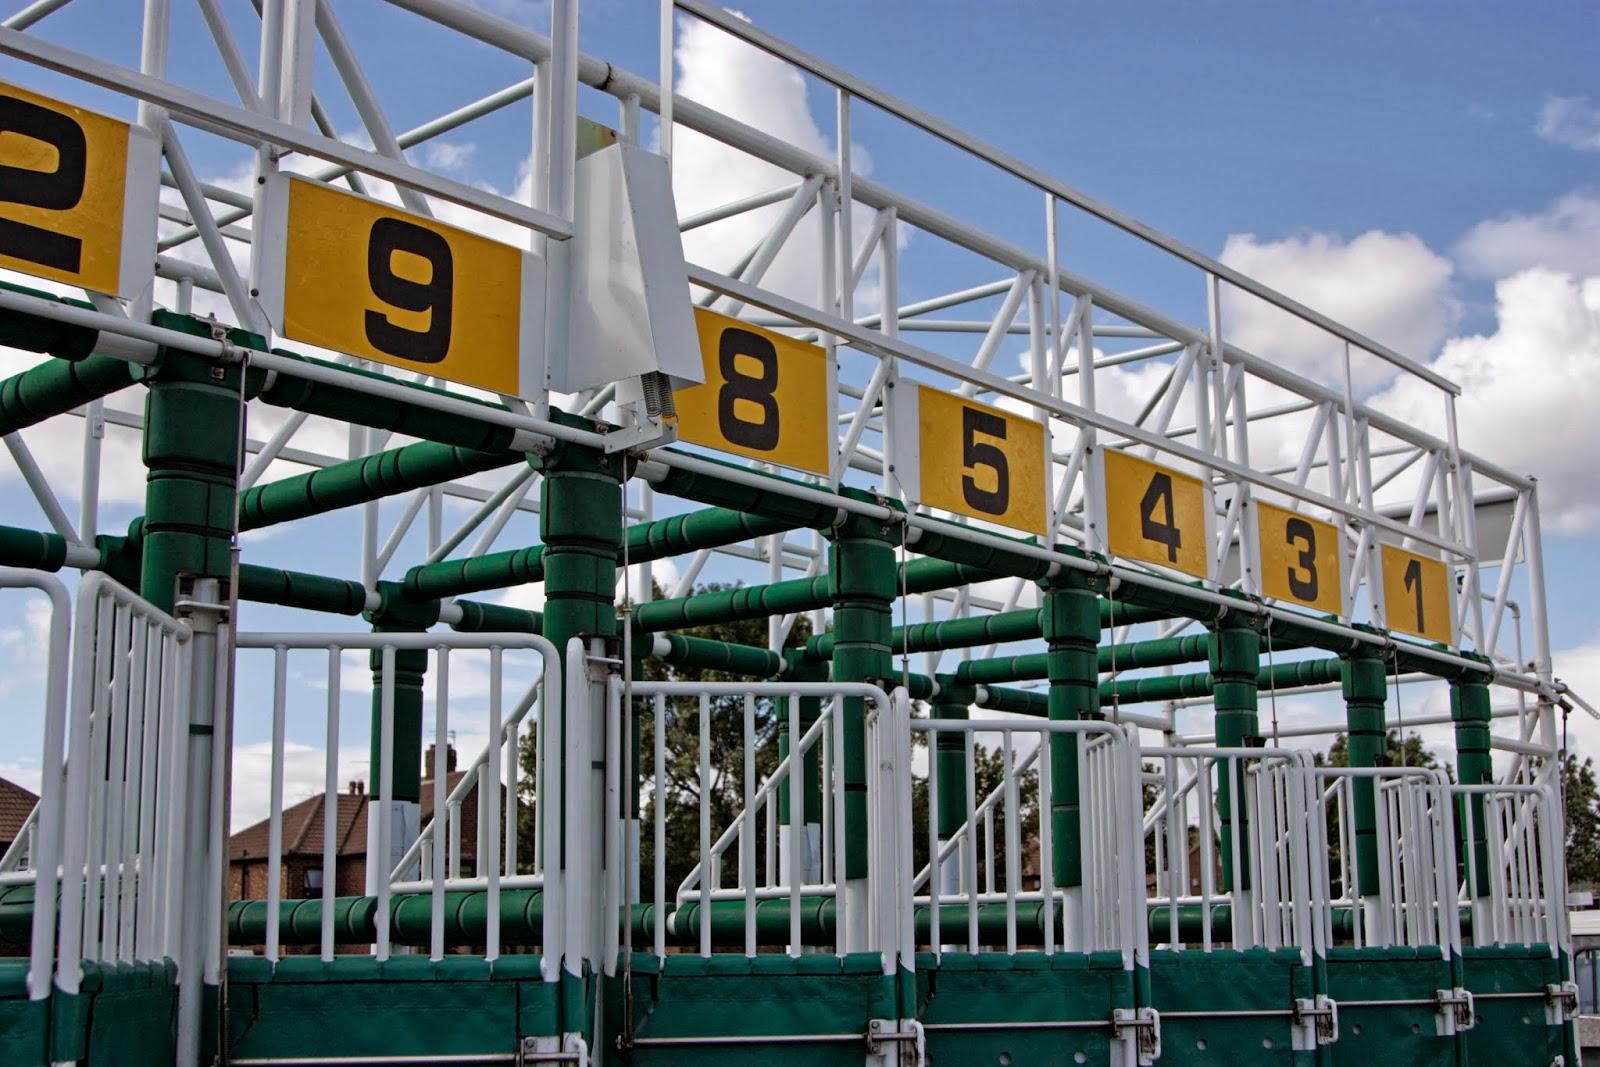 Isle Park Casino in Favor of Isle Casino